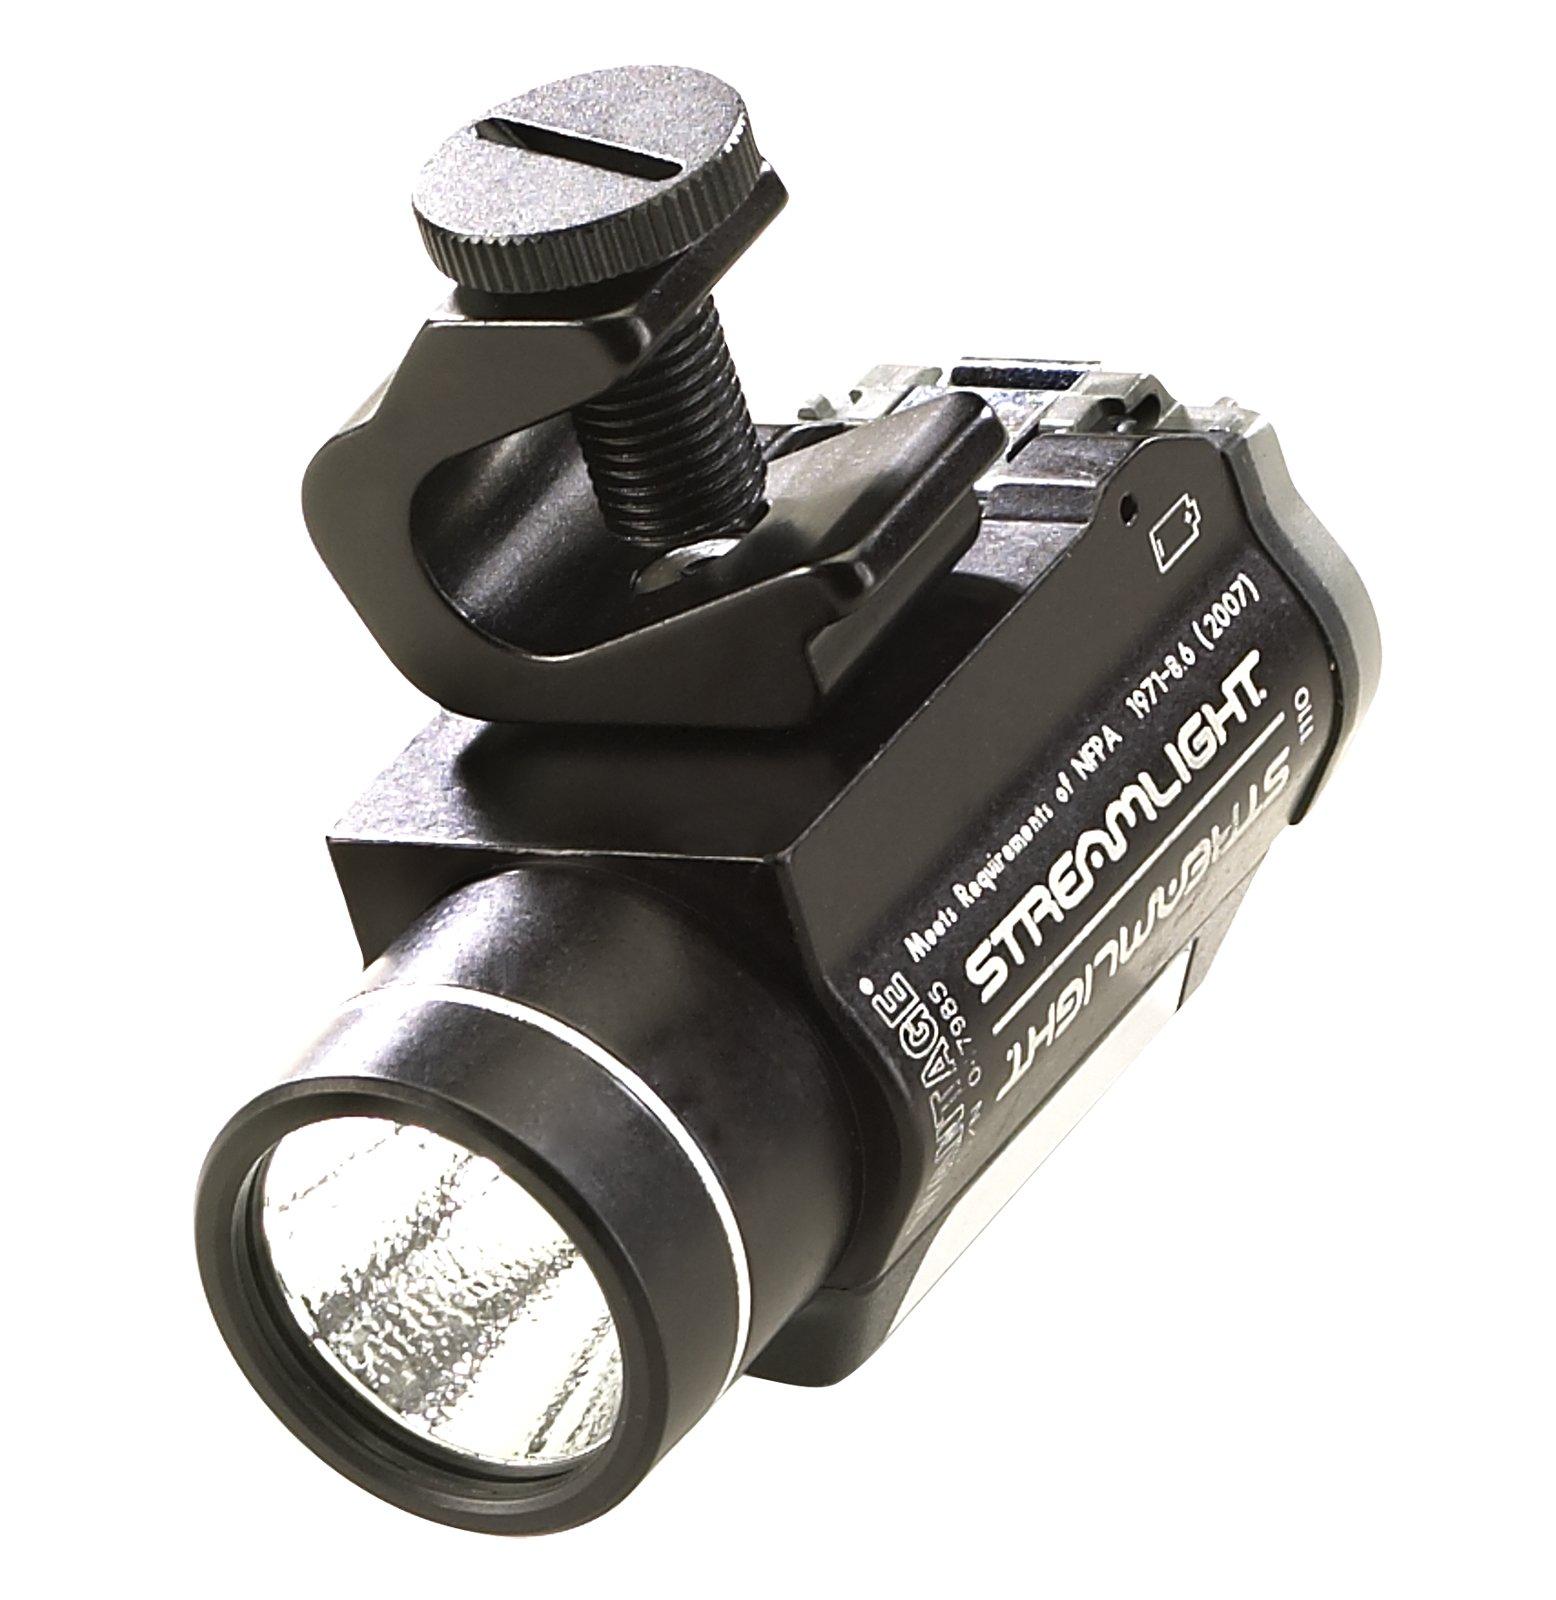 Streamlight 69140 Vantage LED Tactical Helmet Mounted Flashlight by Streamlight